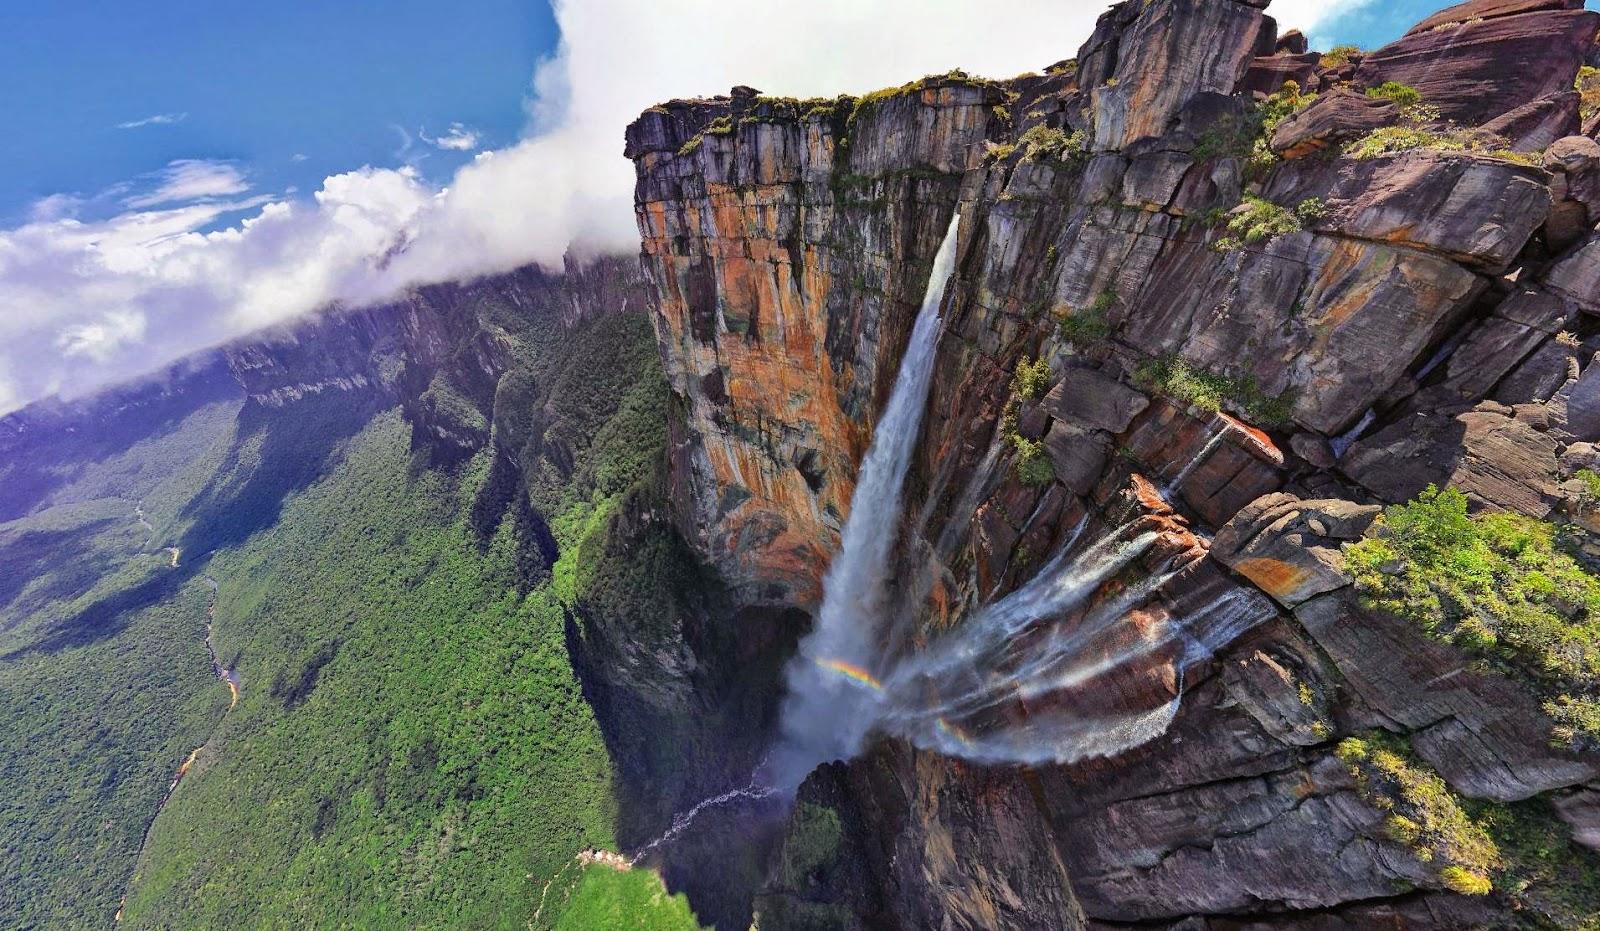 Caribbean Sea, holiday in Venezuela, Playa Colorada, Miss Venezuela, night life in Caracas, diving in Puerto La Cruz, holiday tips, Angel falls